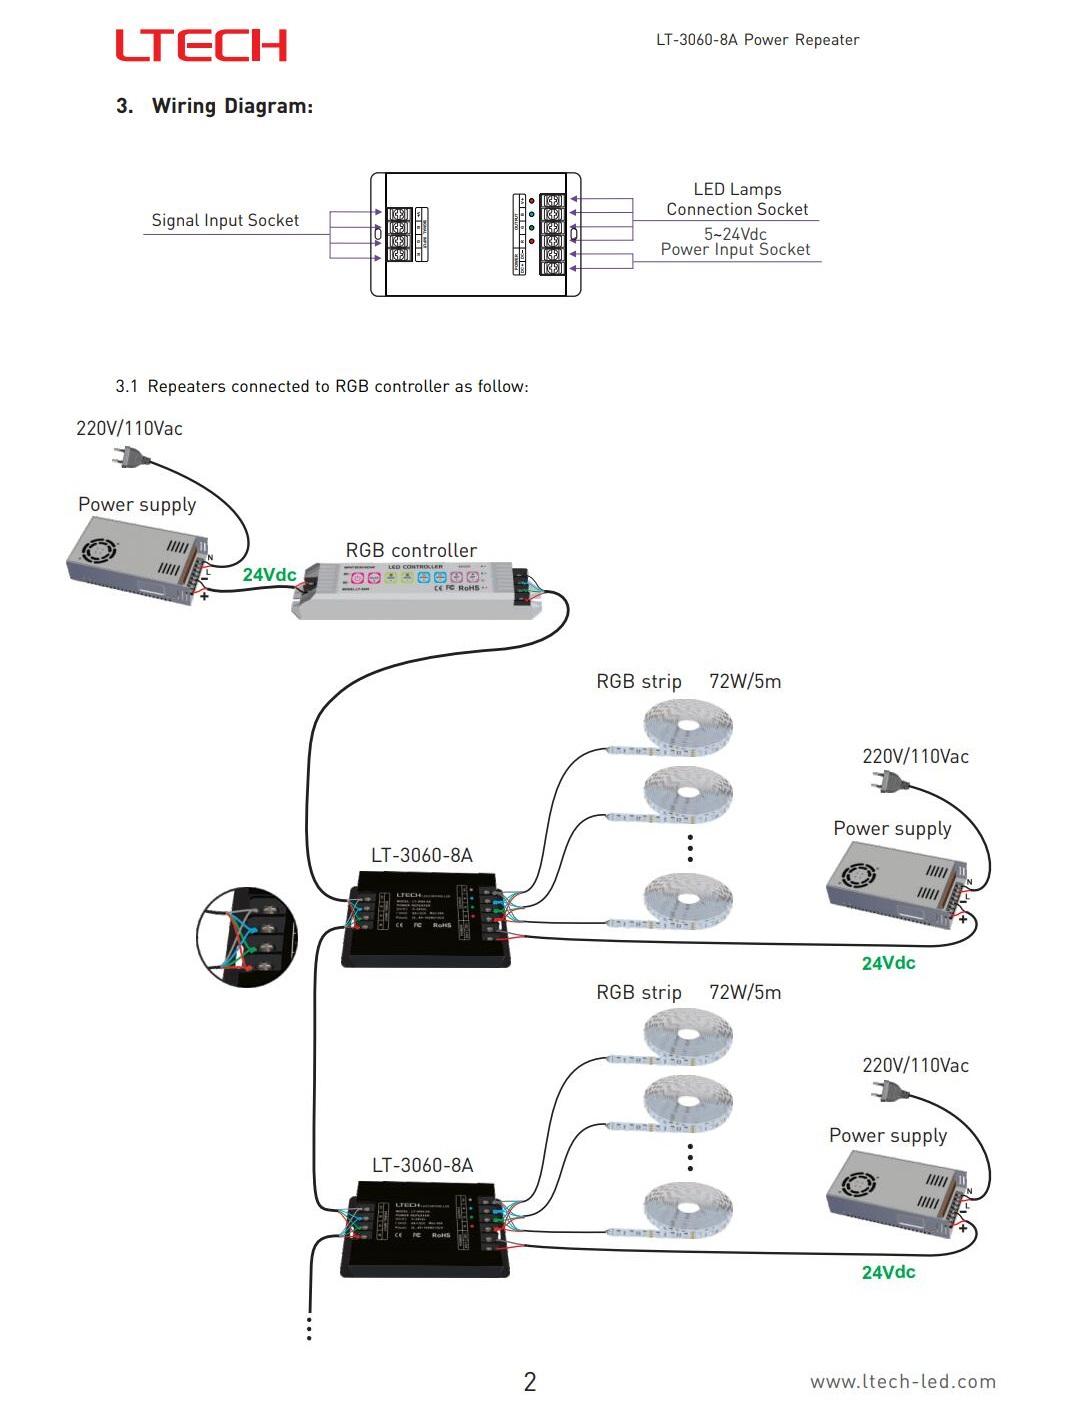 CV_Power_Repeater_LT_3060_8A_2